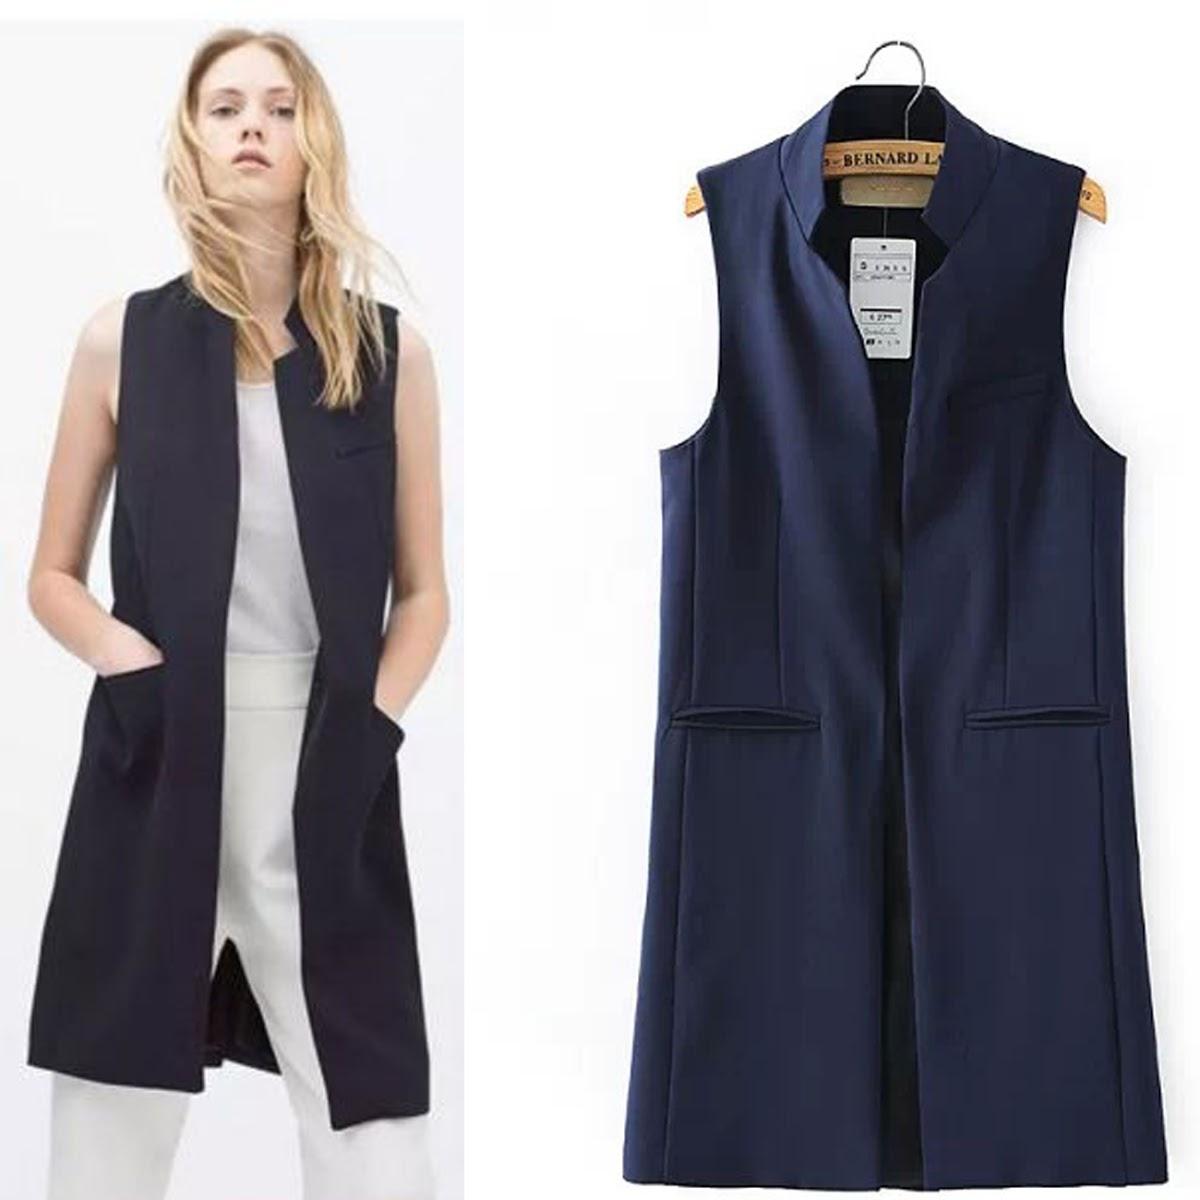 d064284175d Women s Mandarin Collar Open Front Long Vest Waistcoat Cardigan Blazer Sleeveless  Jacket Outfit Women Long Business Suit Vest Long Vest Business Vest Blazer  ...